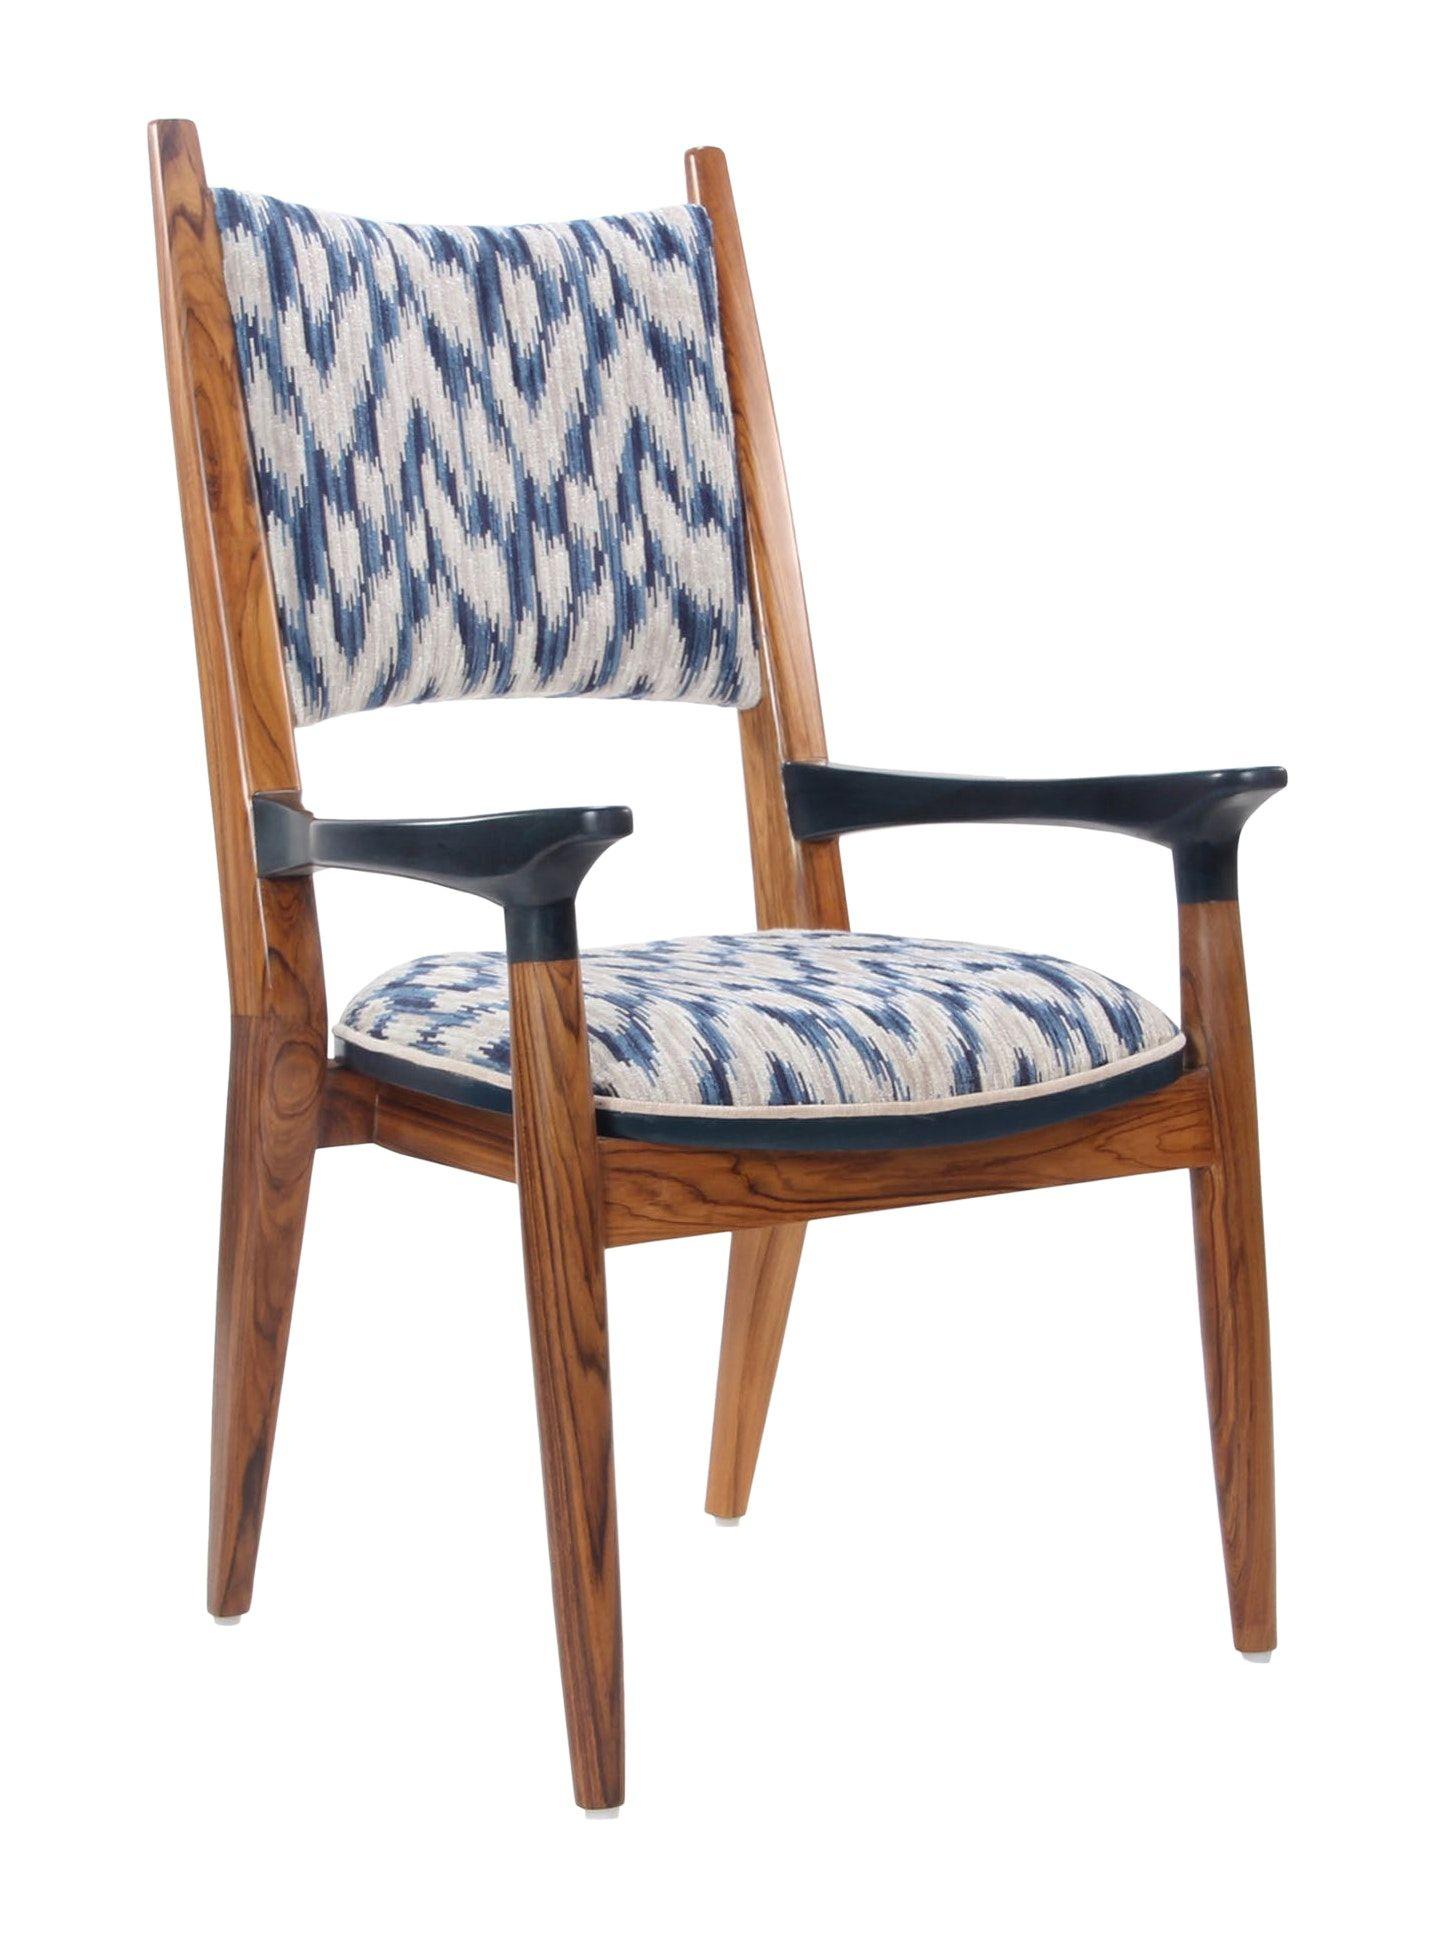 Vinil A Wooden Upholstered Chair By Alankaram Upholstered